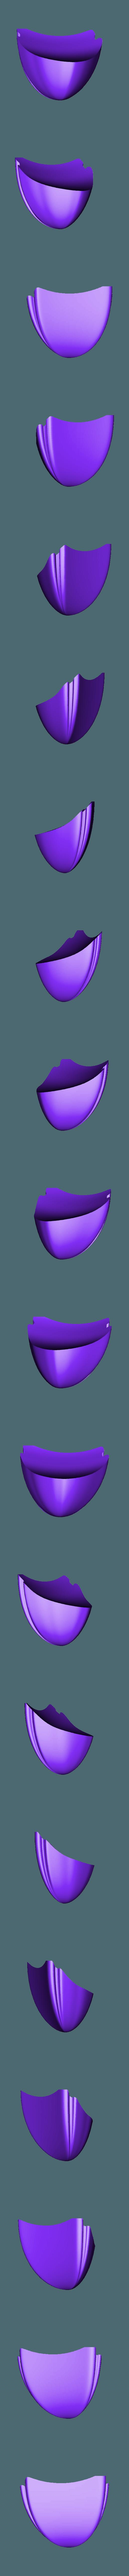 beak_yellow.stl Download free STL file Badtz-Maru (バッドばつ丸, Baddo Batsu Maru) • 3D printable design, Jangie